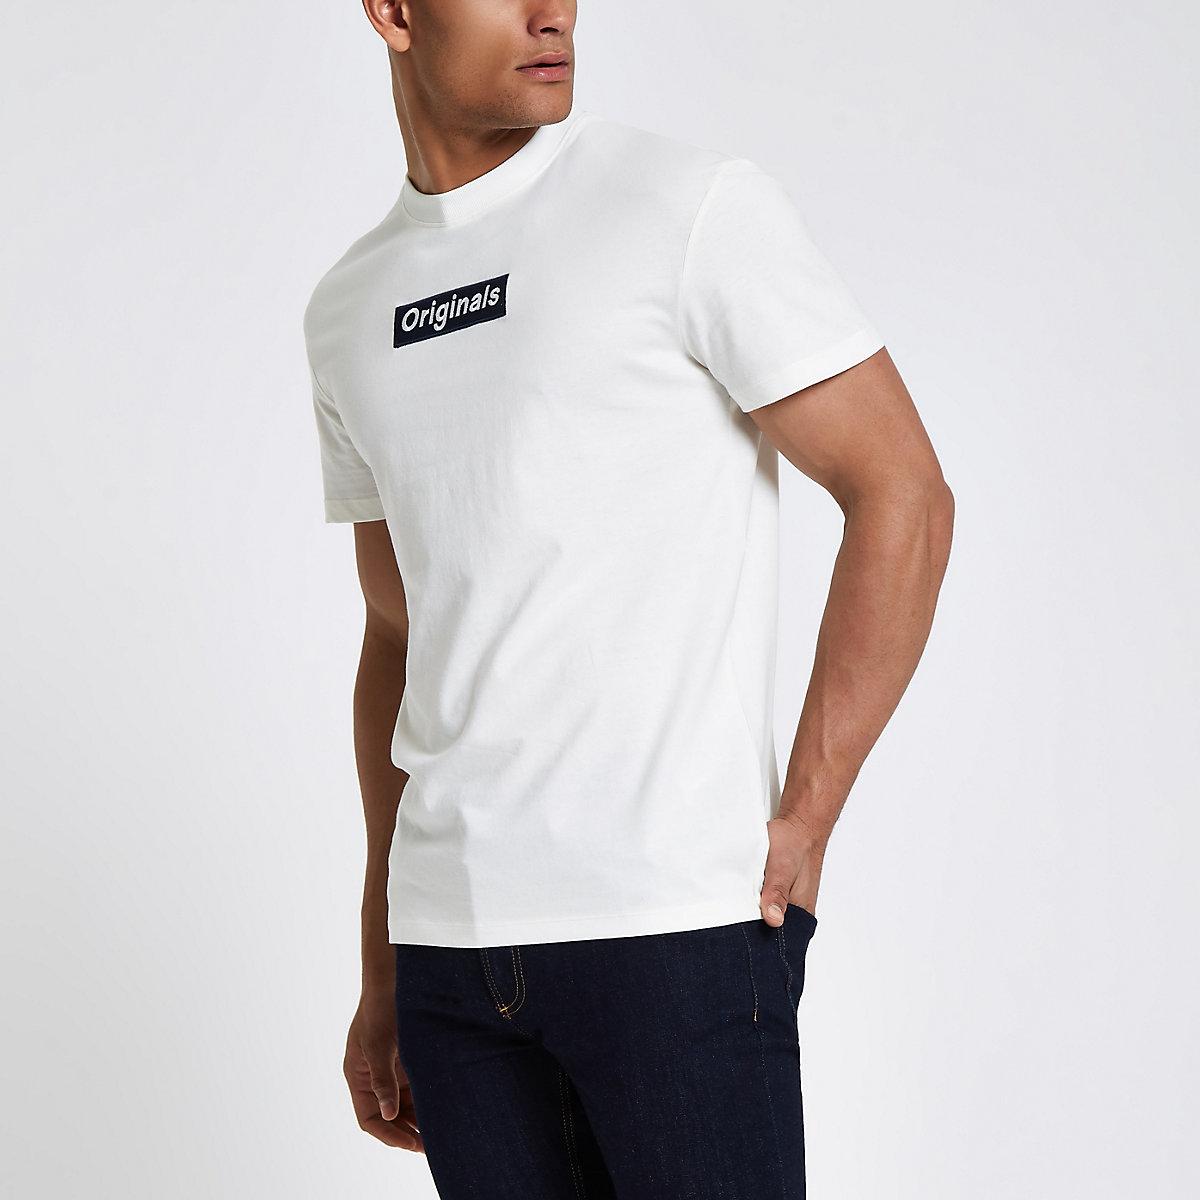 Jack & Jones Originals white T-shirt